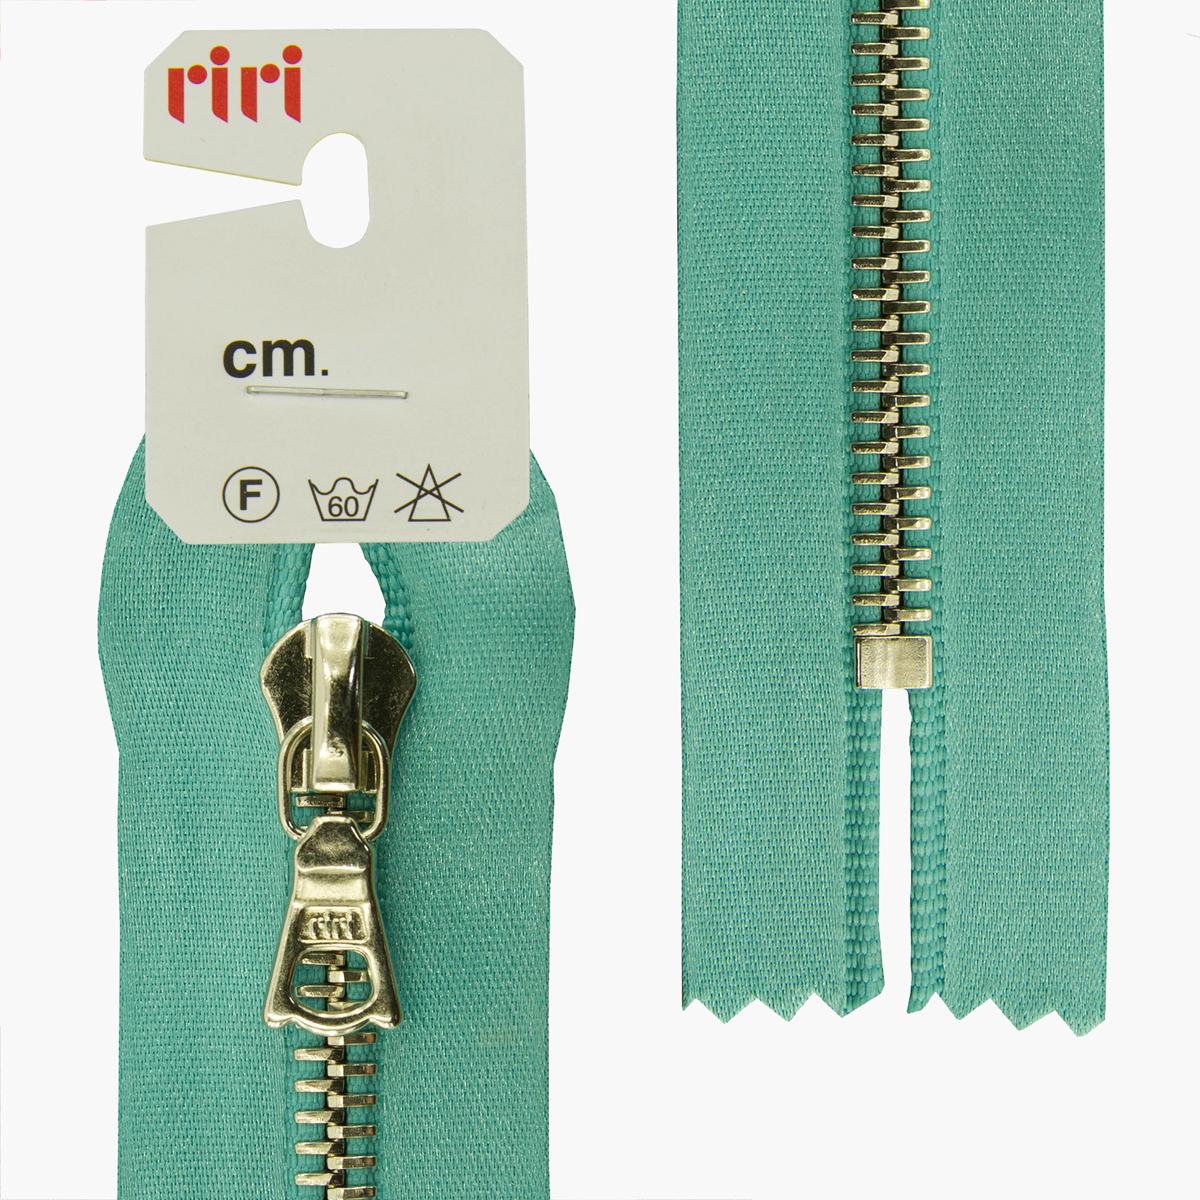 Застежка-молния Riri Ni, неразъемная, на атласной тесьме, цвет: бирюзовый (5859), ширина 6 мм, длина 16 см молния riri ni карманная неразъемная на атласной тесьме цвет синий 9603 16 х 0 6 см